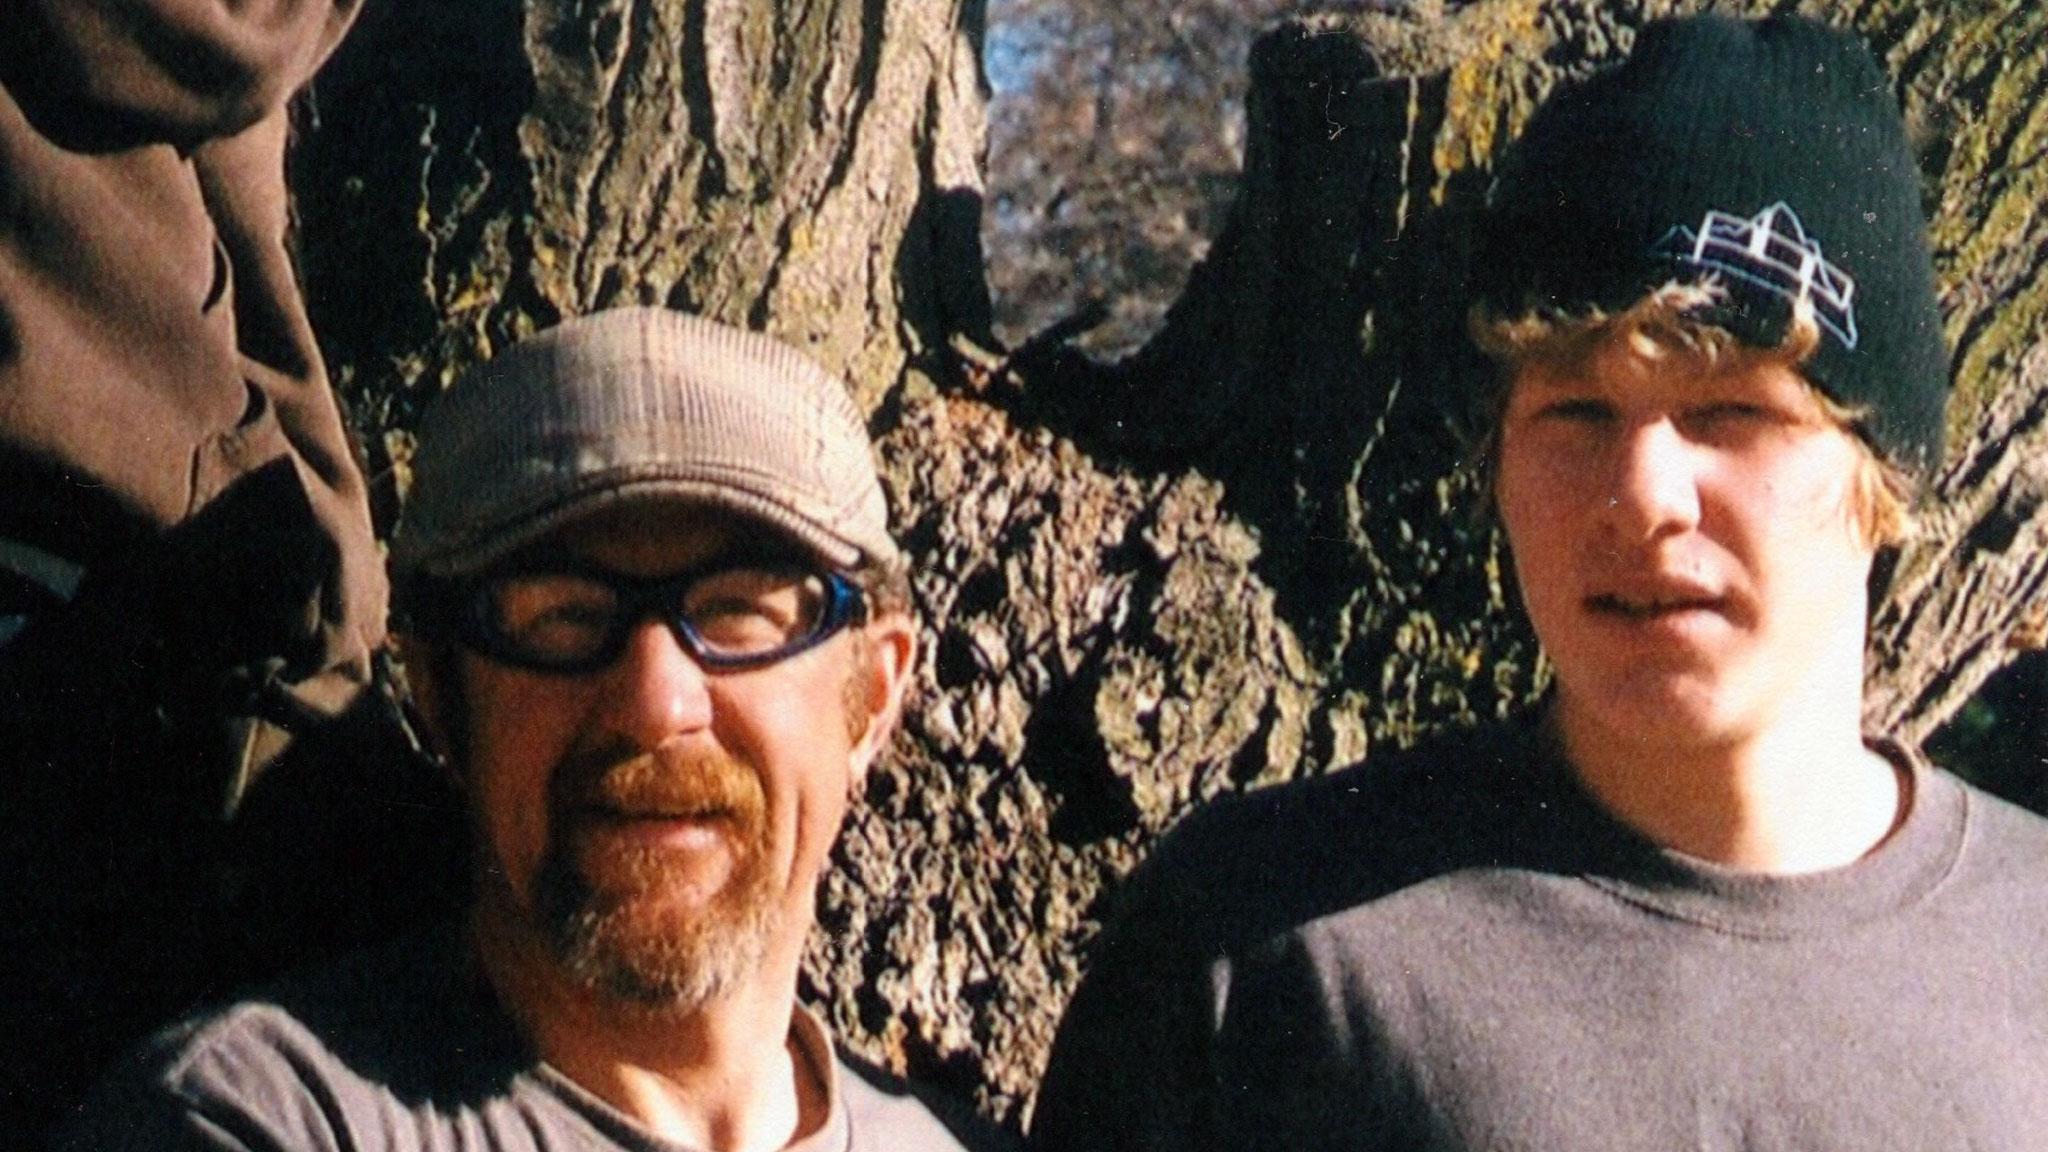 Ian and Leif